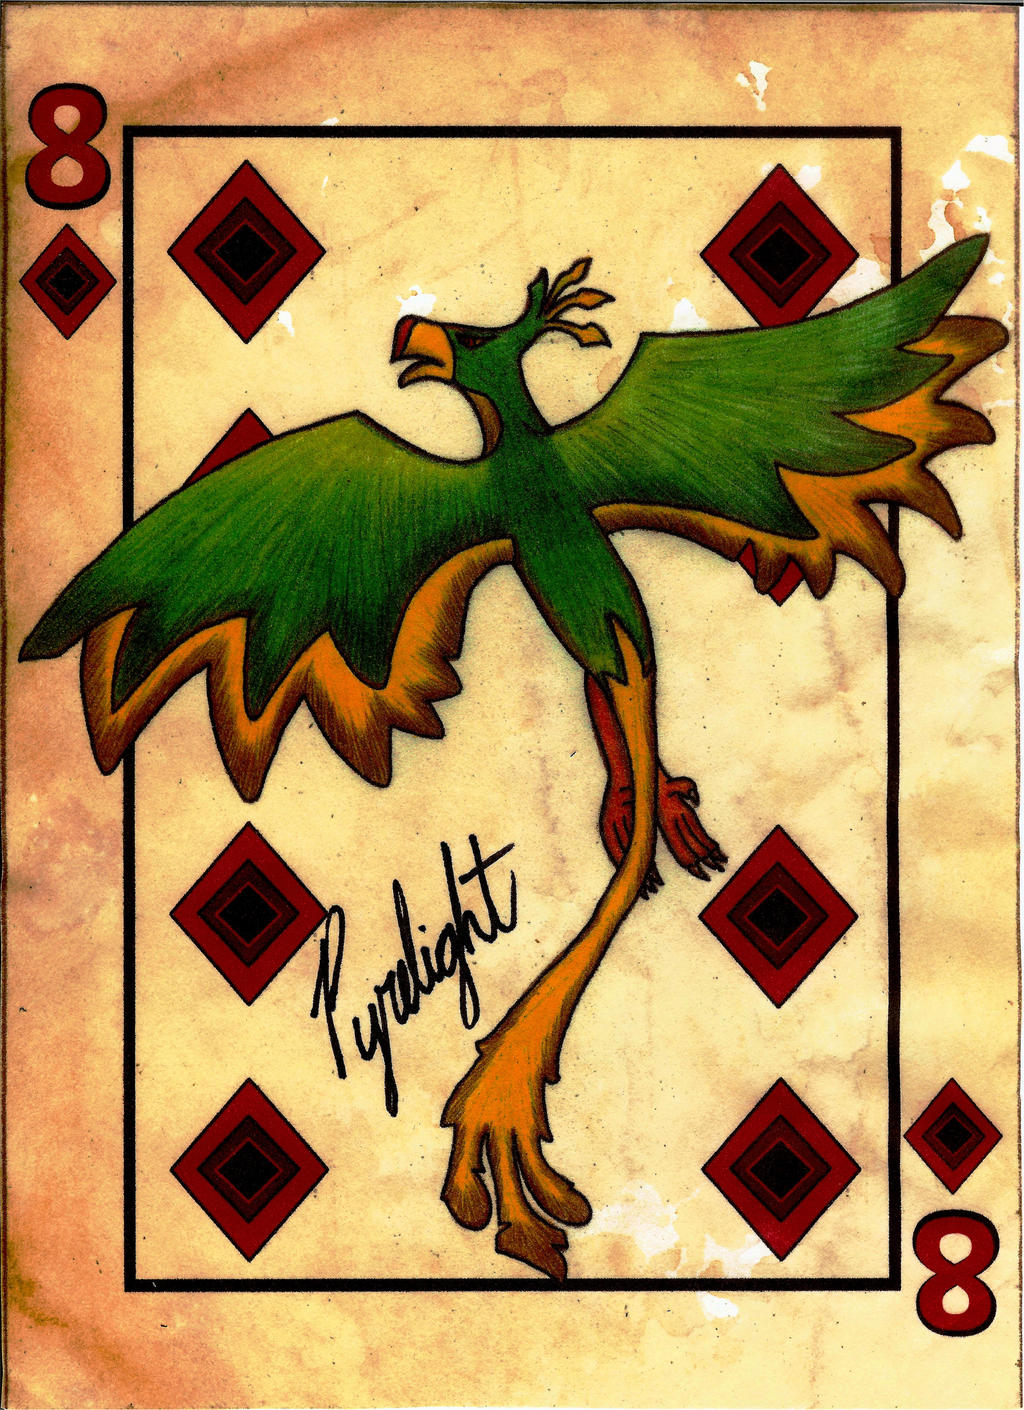 FOE Playing Card - 8 of Diamonds - Pyrelight